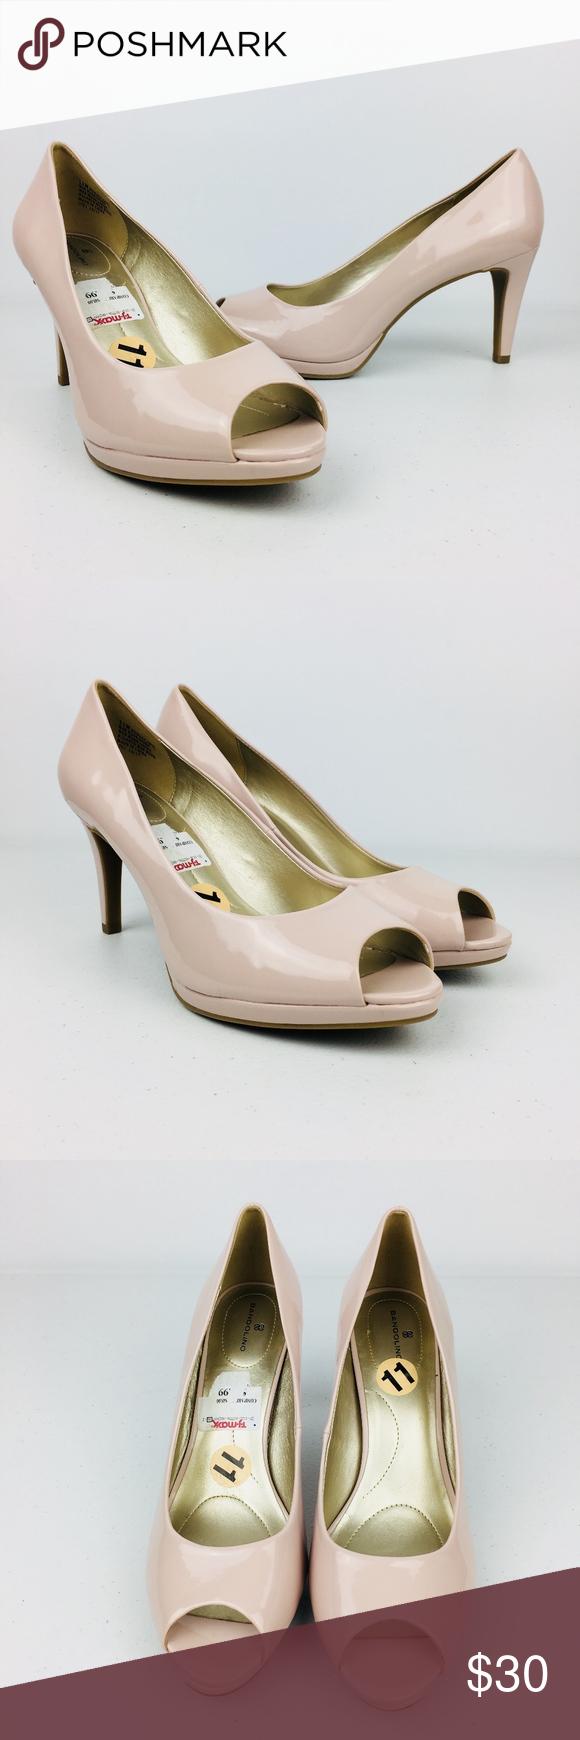 ⭐️NEW Bandolino Peep Toe Pink Blush